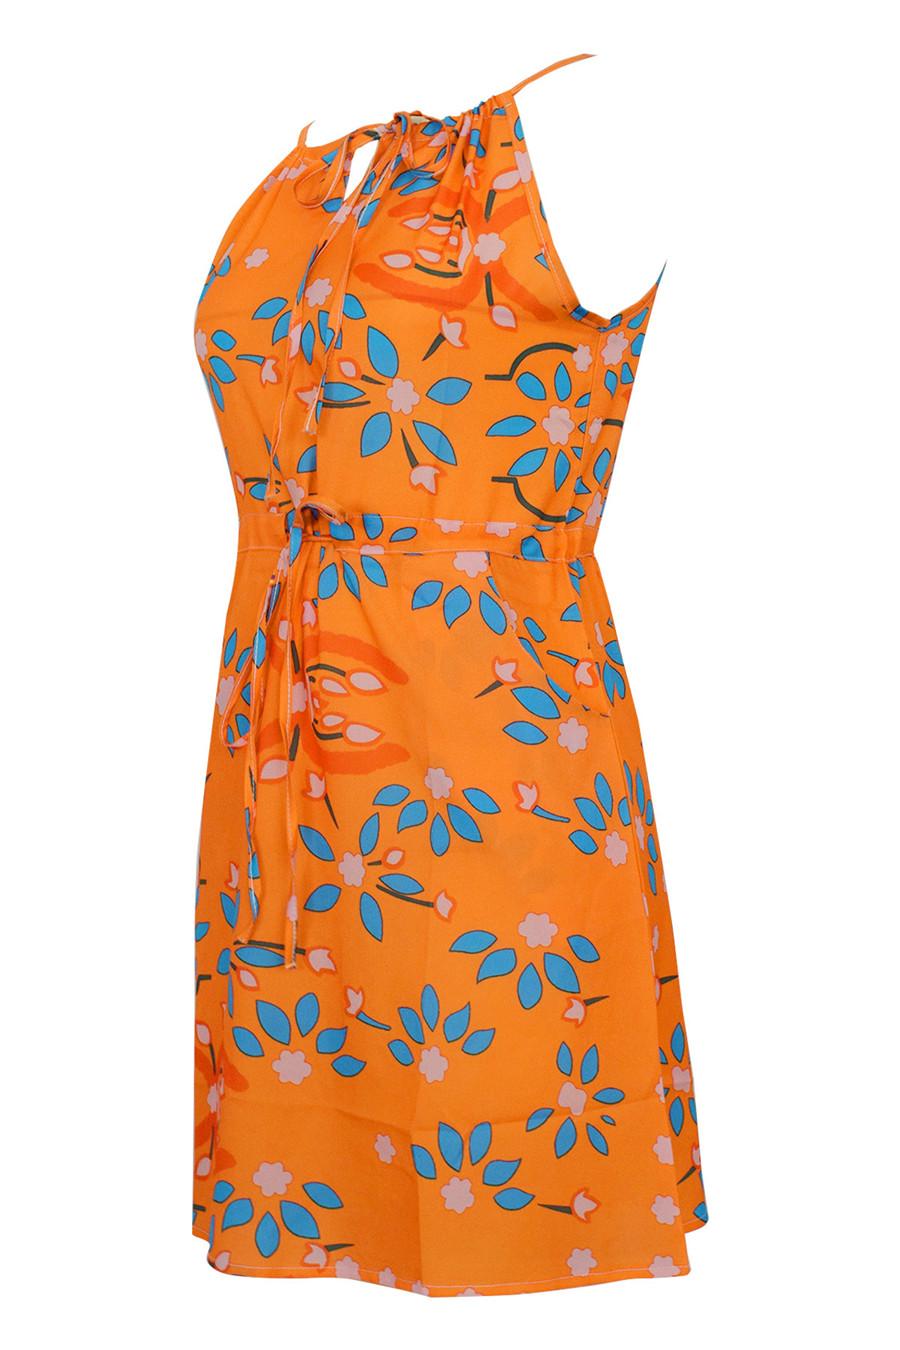 Gladiolus Chiffon Women Summer Dress Spaghetti Strap Floral Print Pocket Sexy Bohemian Beach Dress 2019 Short Ladies Dresses (16)